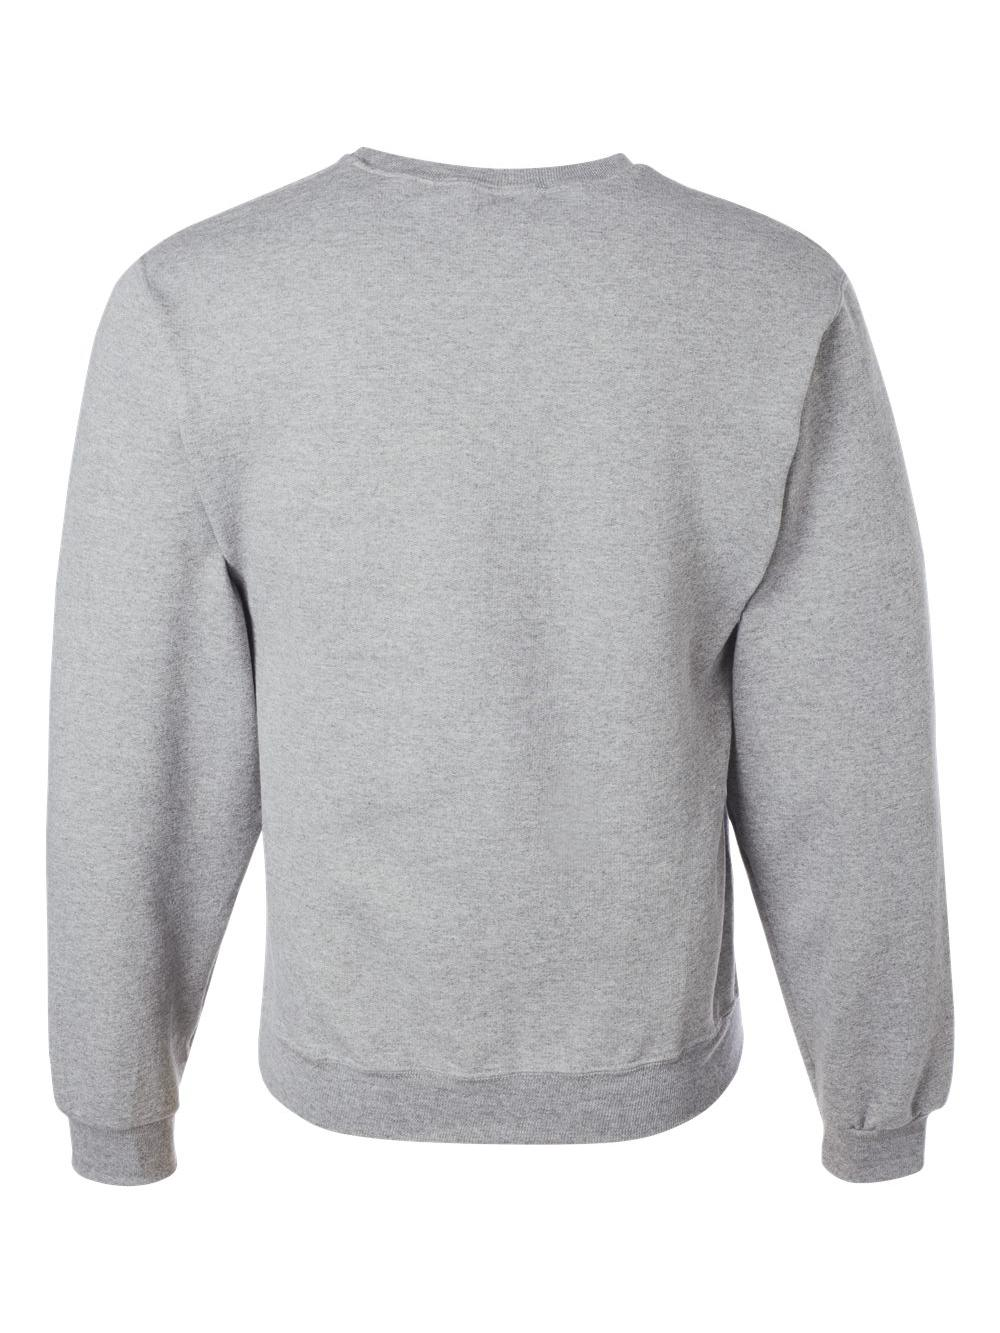 Jerzees-NuBlend-Crewneck-Sweatshirt-562MR thumbnail 7